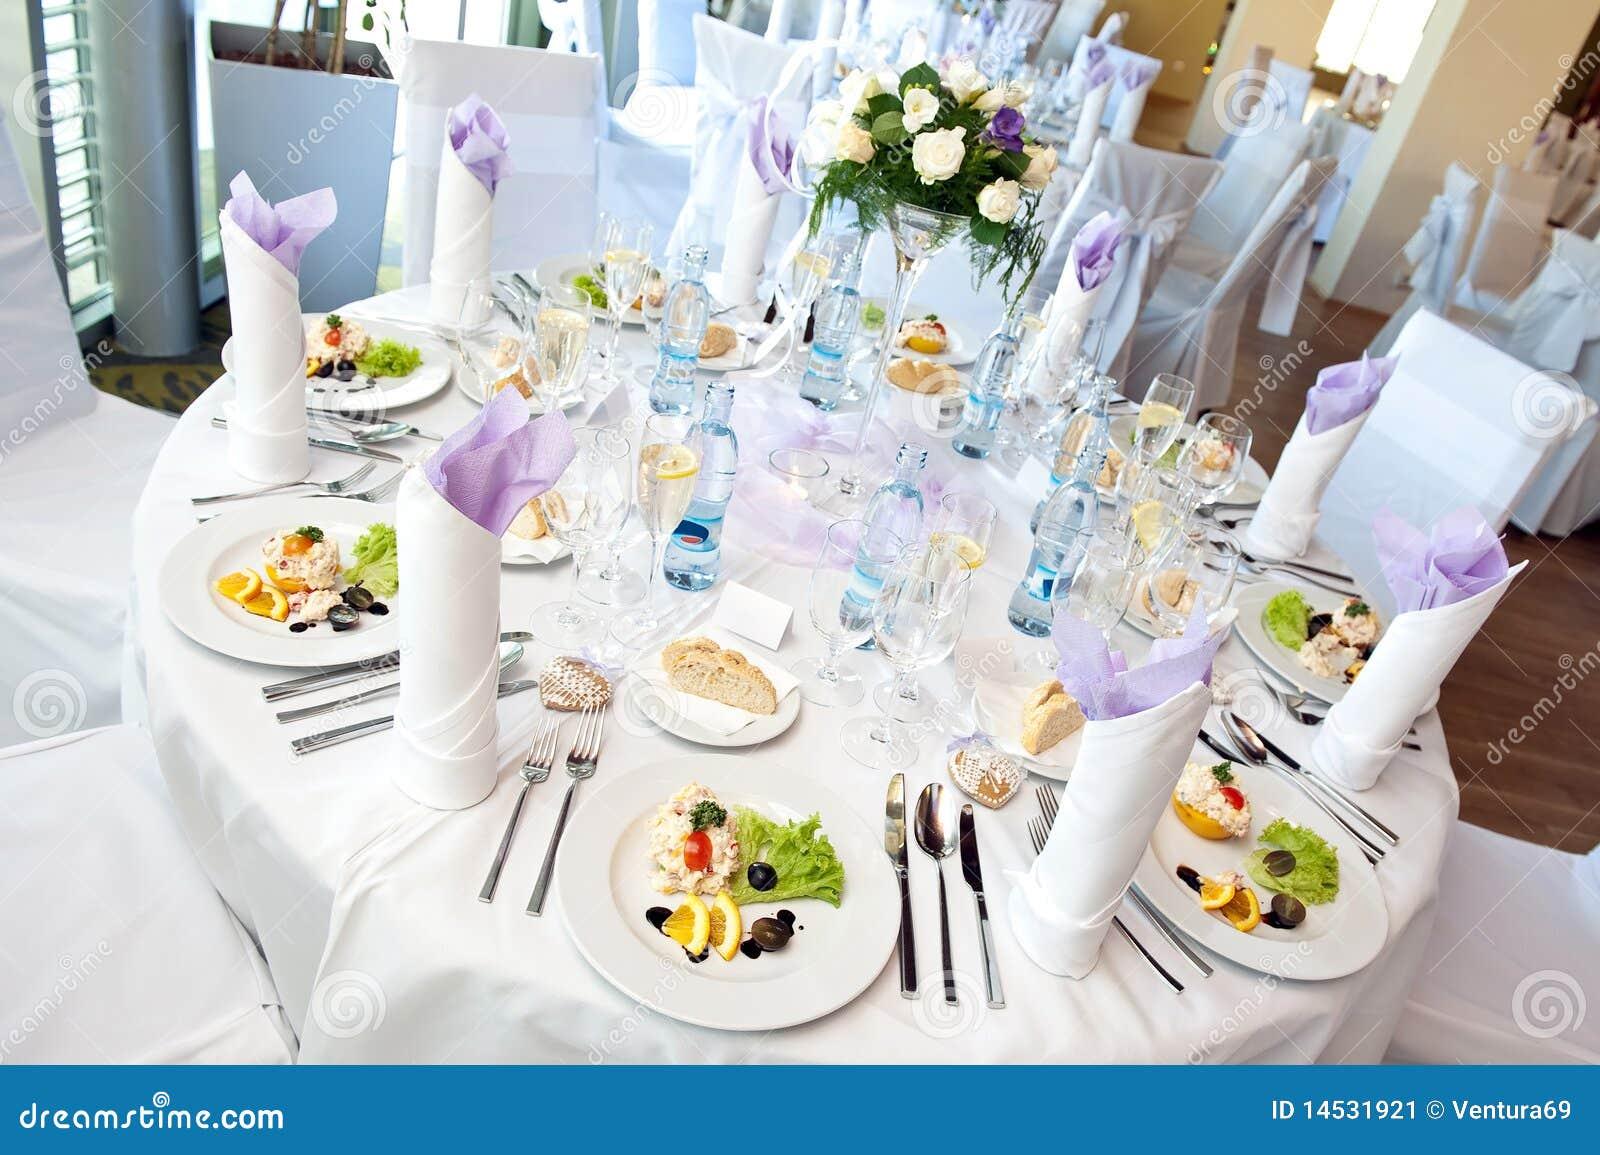 Wedding Table Setting Stock Image Image 14531921